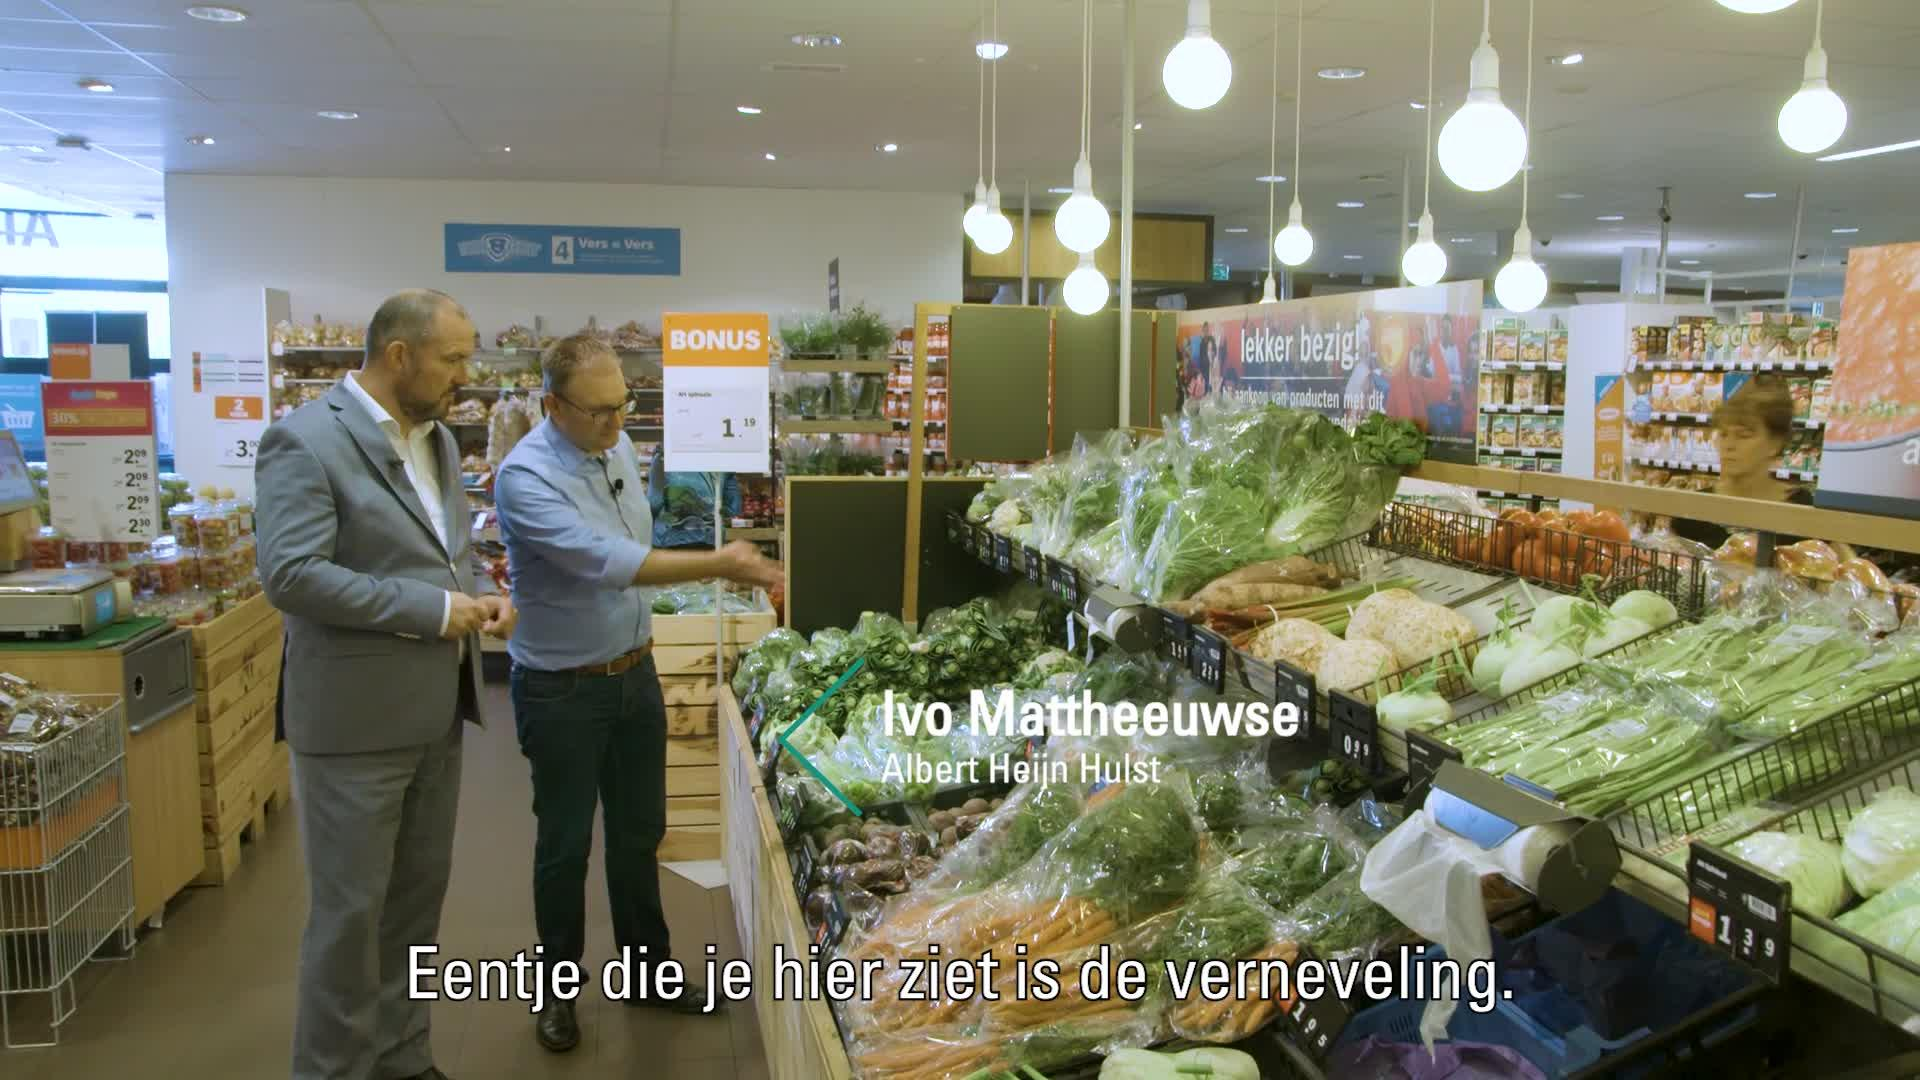 Circulair Ondernemen Biedt Supermarktondernemer Kansen Distrifood